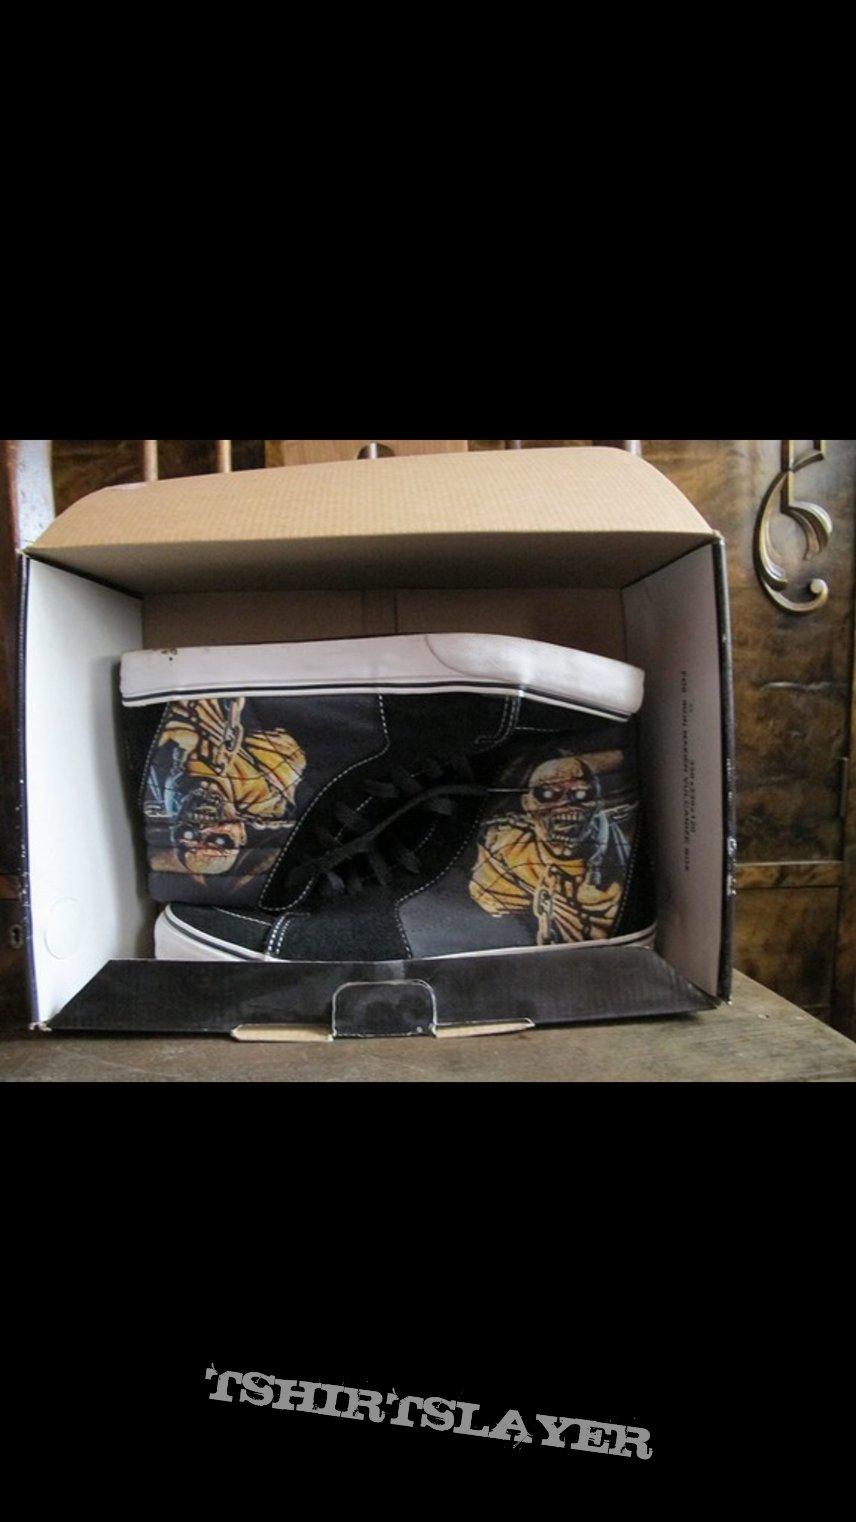 Iron maiden vans shoes piece of mind